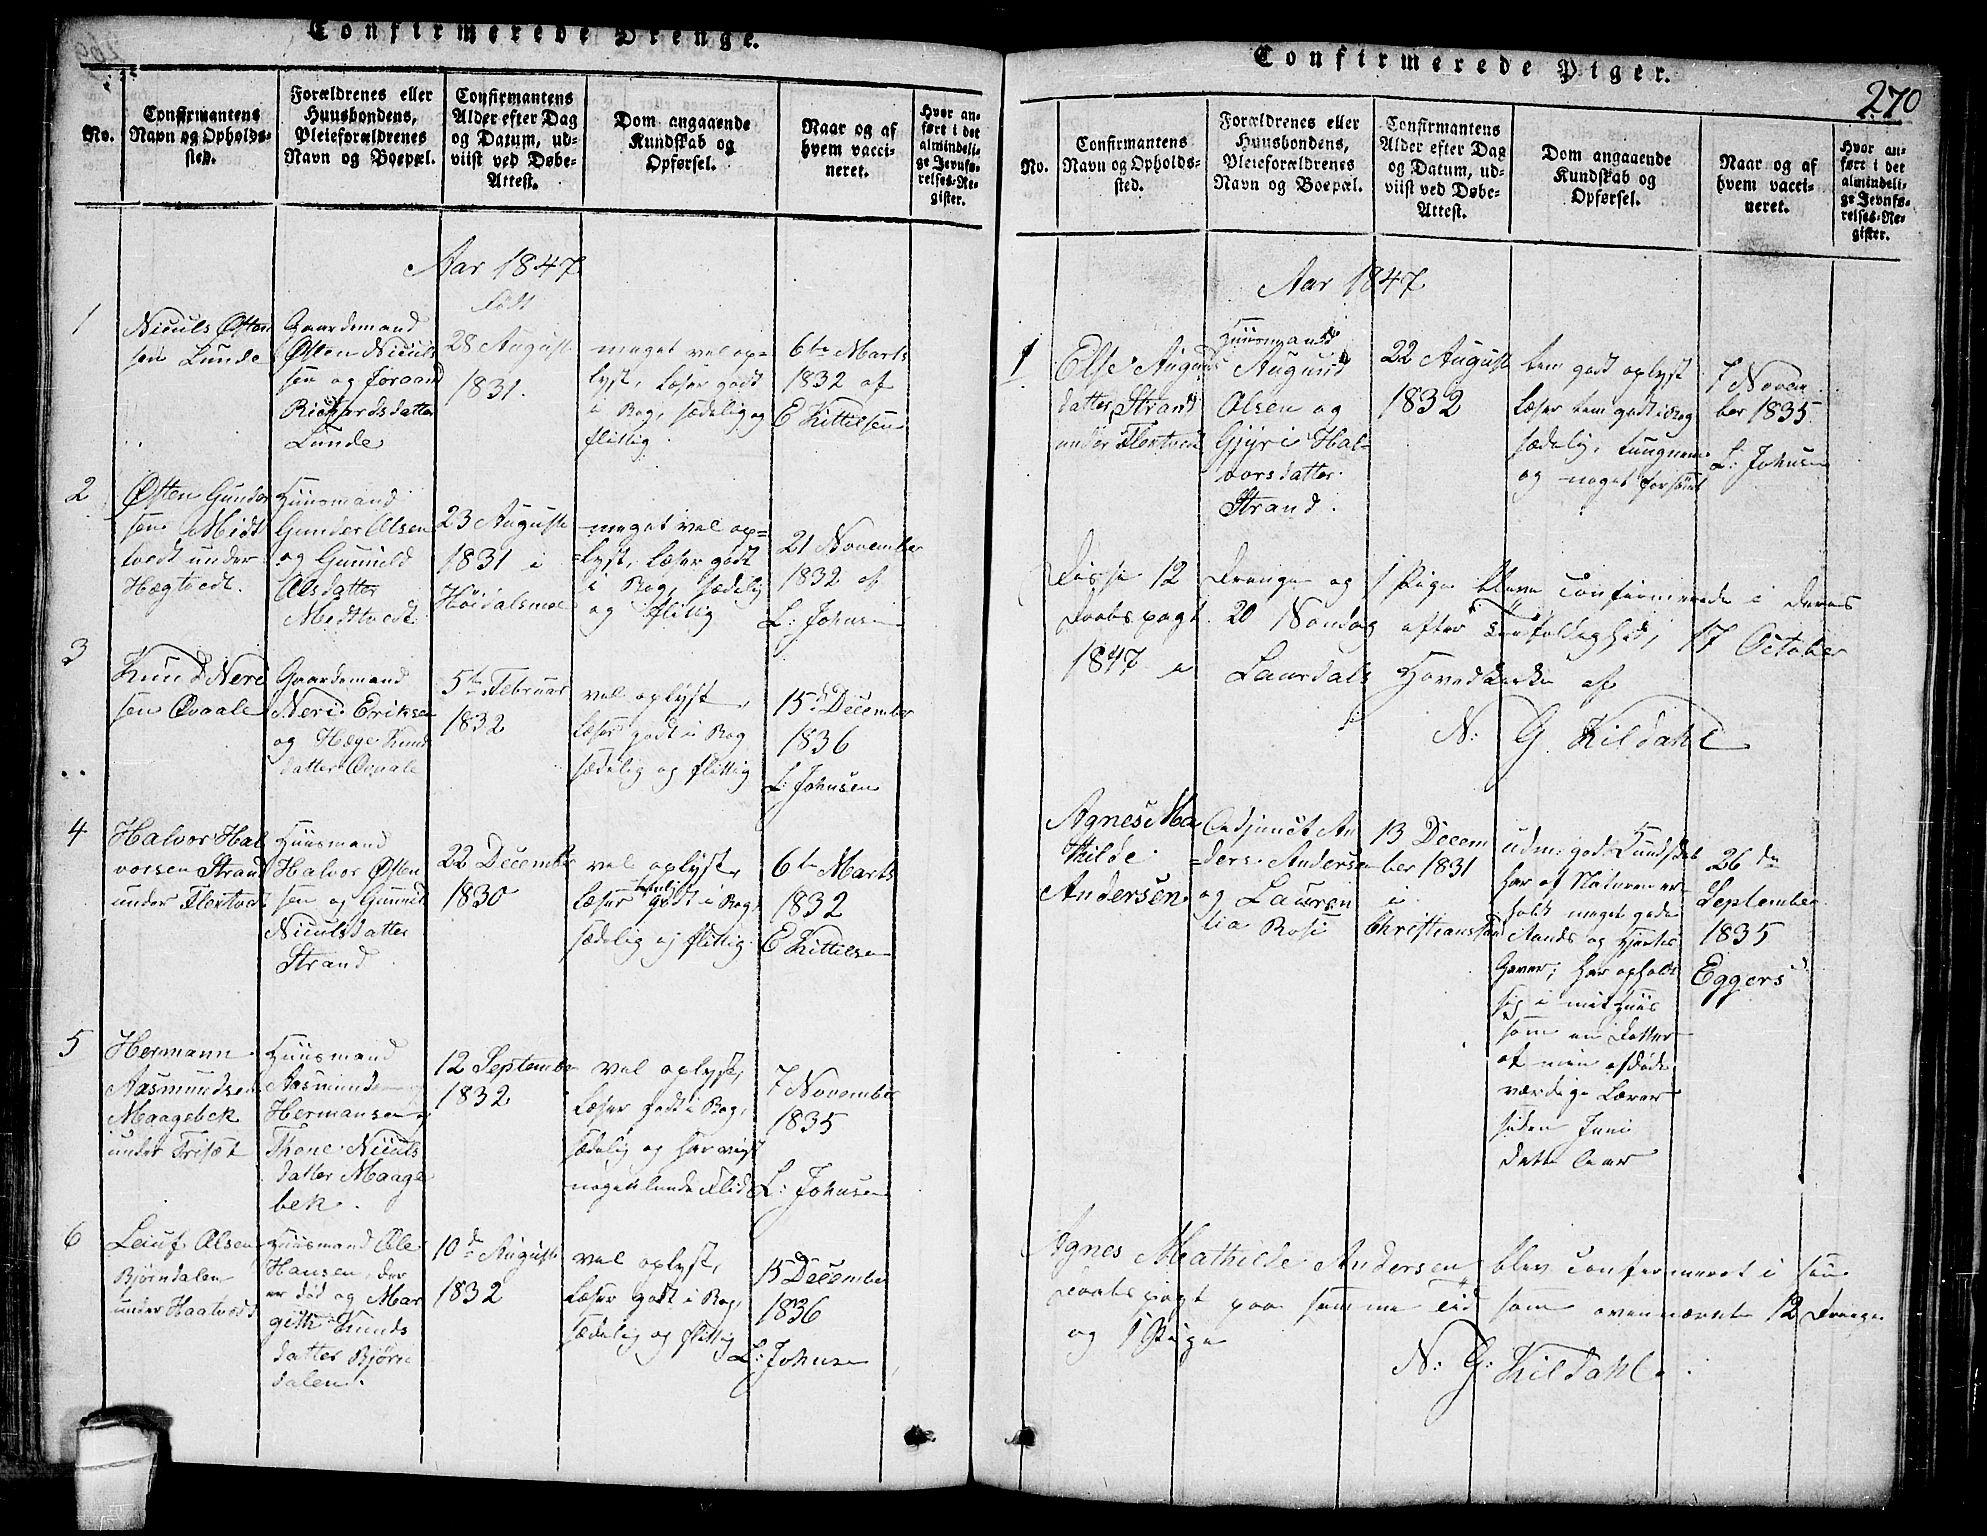 SAKO, Lårdal kirkebøker, G/Ga/L0001: Klokkerbok nr. I 1, 1815-1861, s. 270